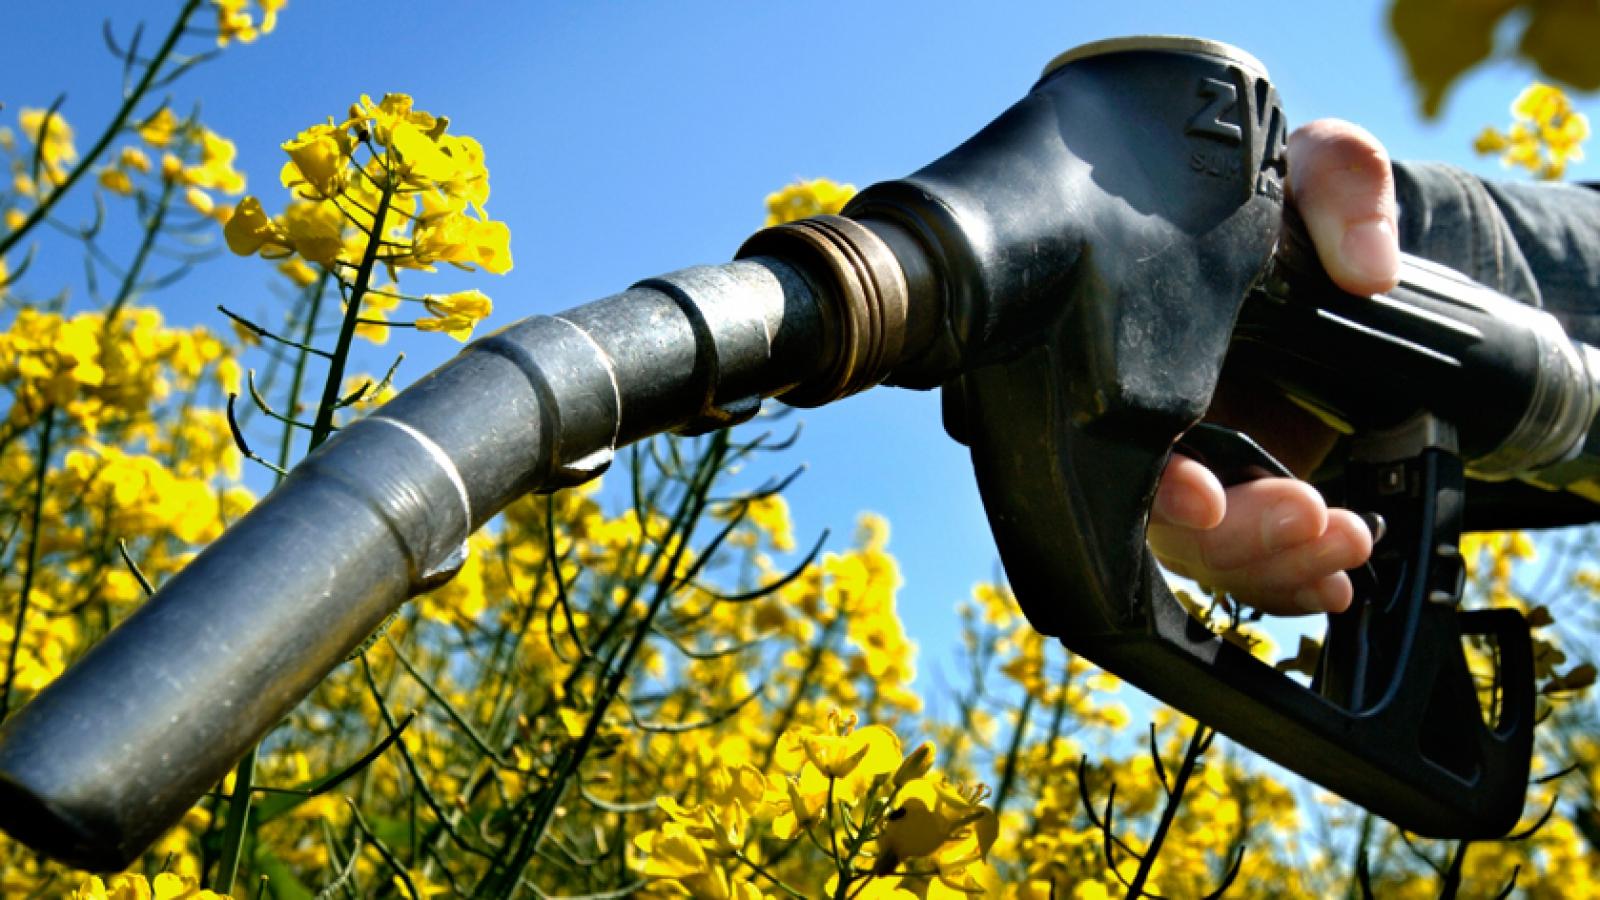 biofuelul-provoaca-pierderea-biodiversitatii